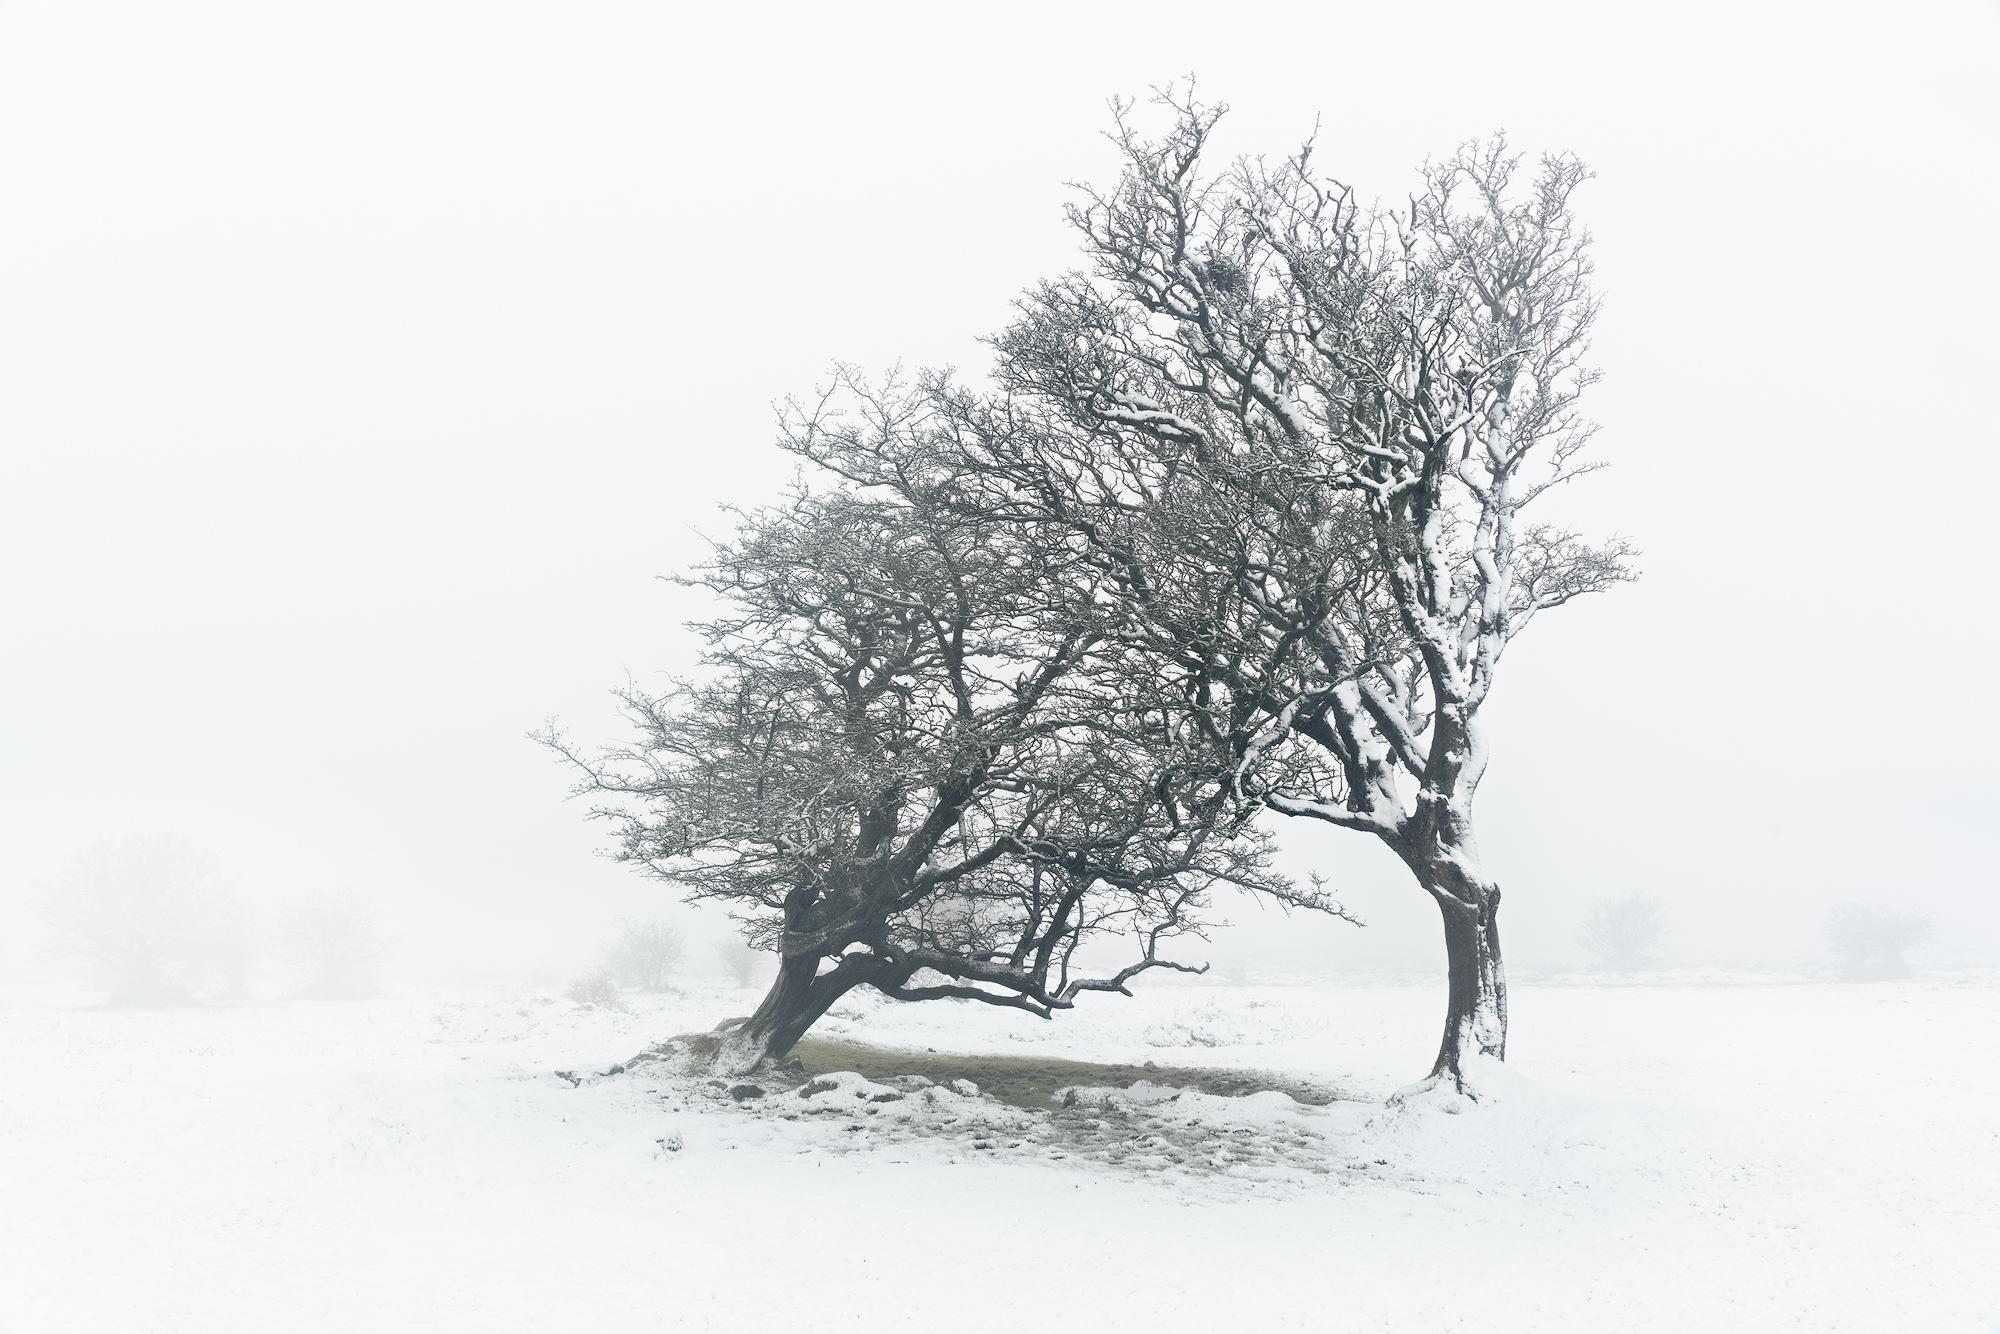 Raw Support, East Dartmoor, February. Sony A7R MK II, Canon EF 24-70 f/4 at 27mm, ISO100, 0.4s at f/11, Tripod. February. © Richard Fox.